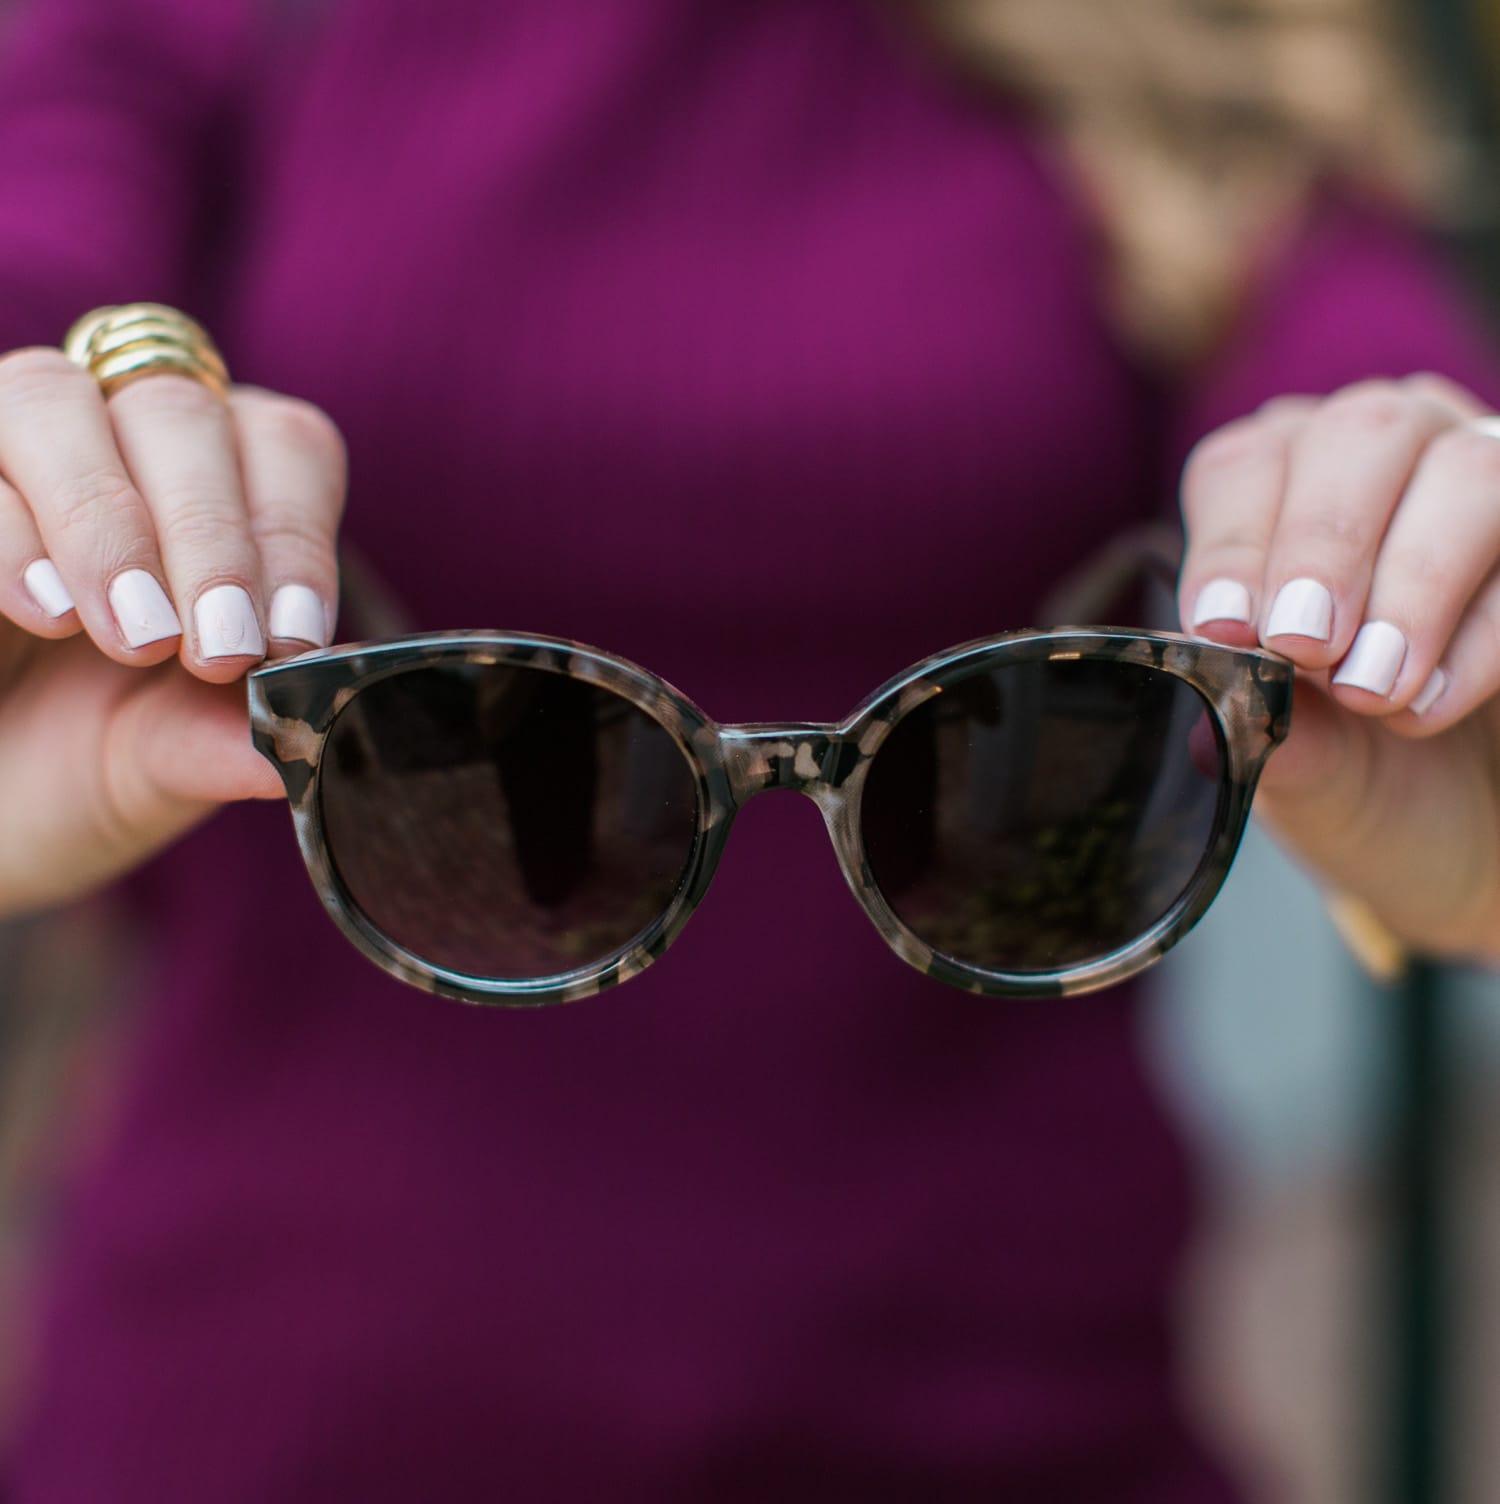 foster-grant-pf-41-retro-round-wayfarer-sunglasses-020